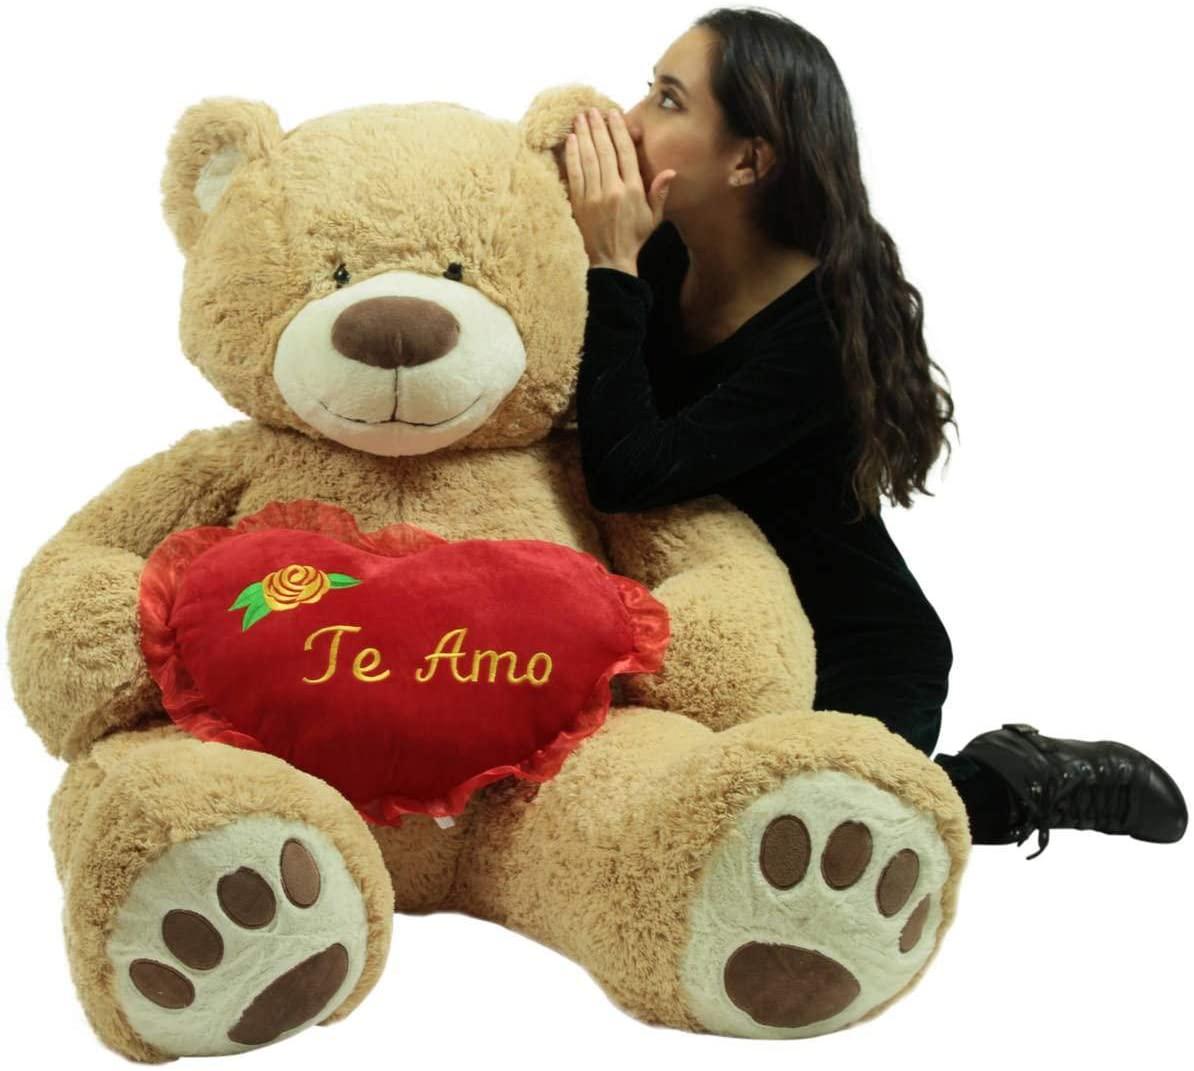 Big Plush Te Amo Giant Teddy Bear 5 Foot Soft Teddybear Romantic Holds Heart Pillow to Show Love